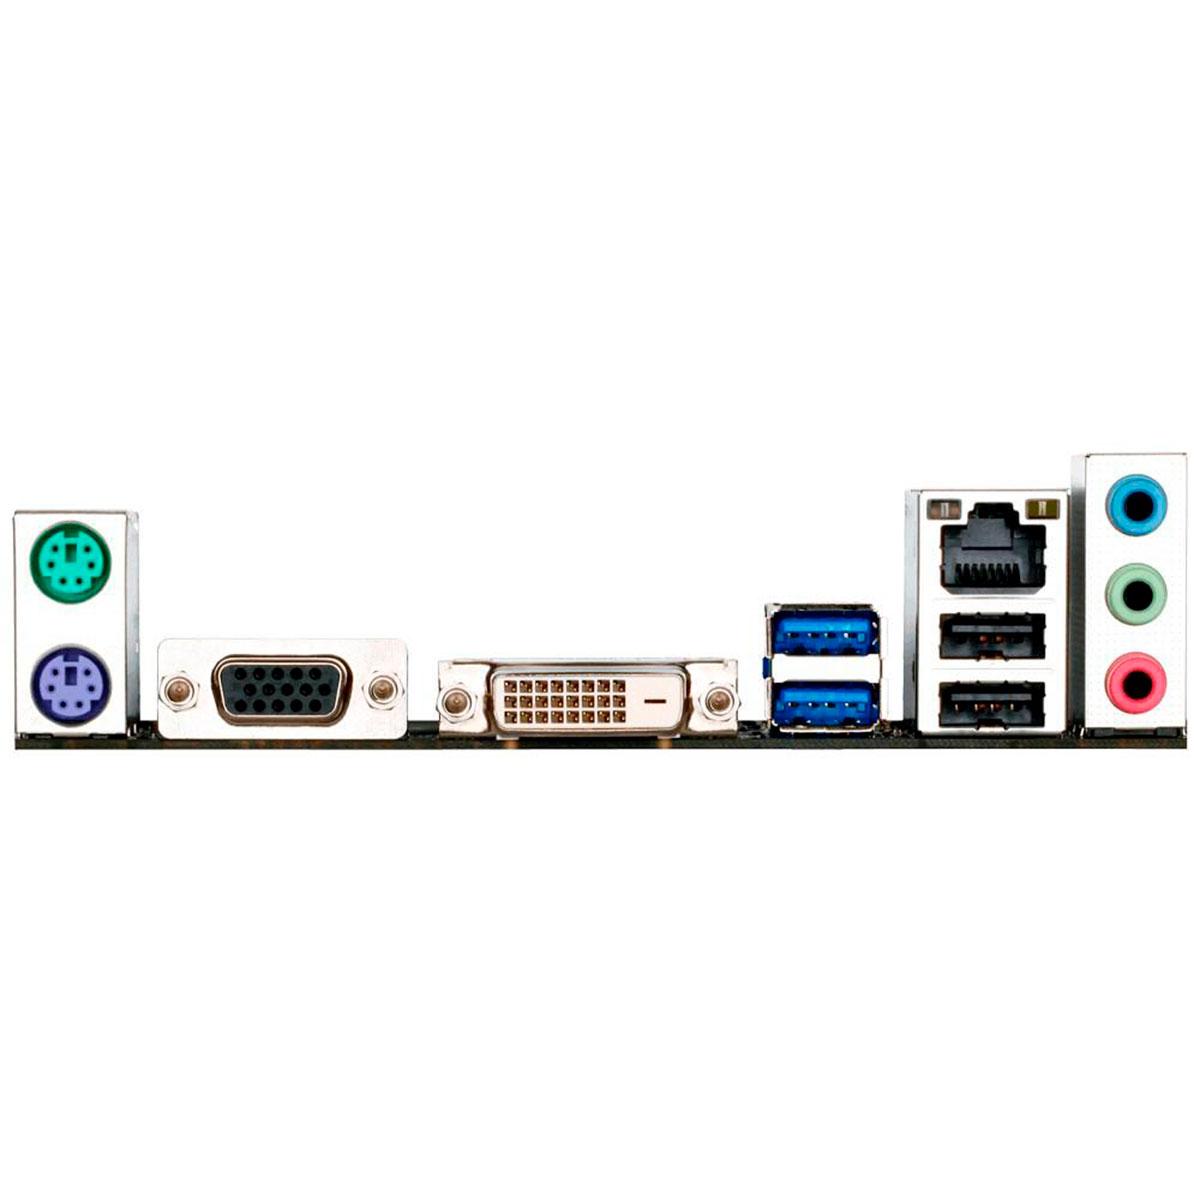 Placa Mãe Gigabyte H110M-S2V, Intel 7ª/6ª Geração, Socket LGA 1151, DDR4